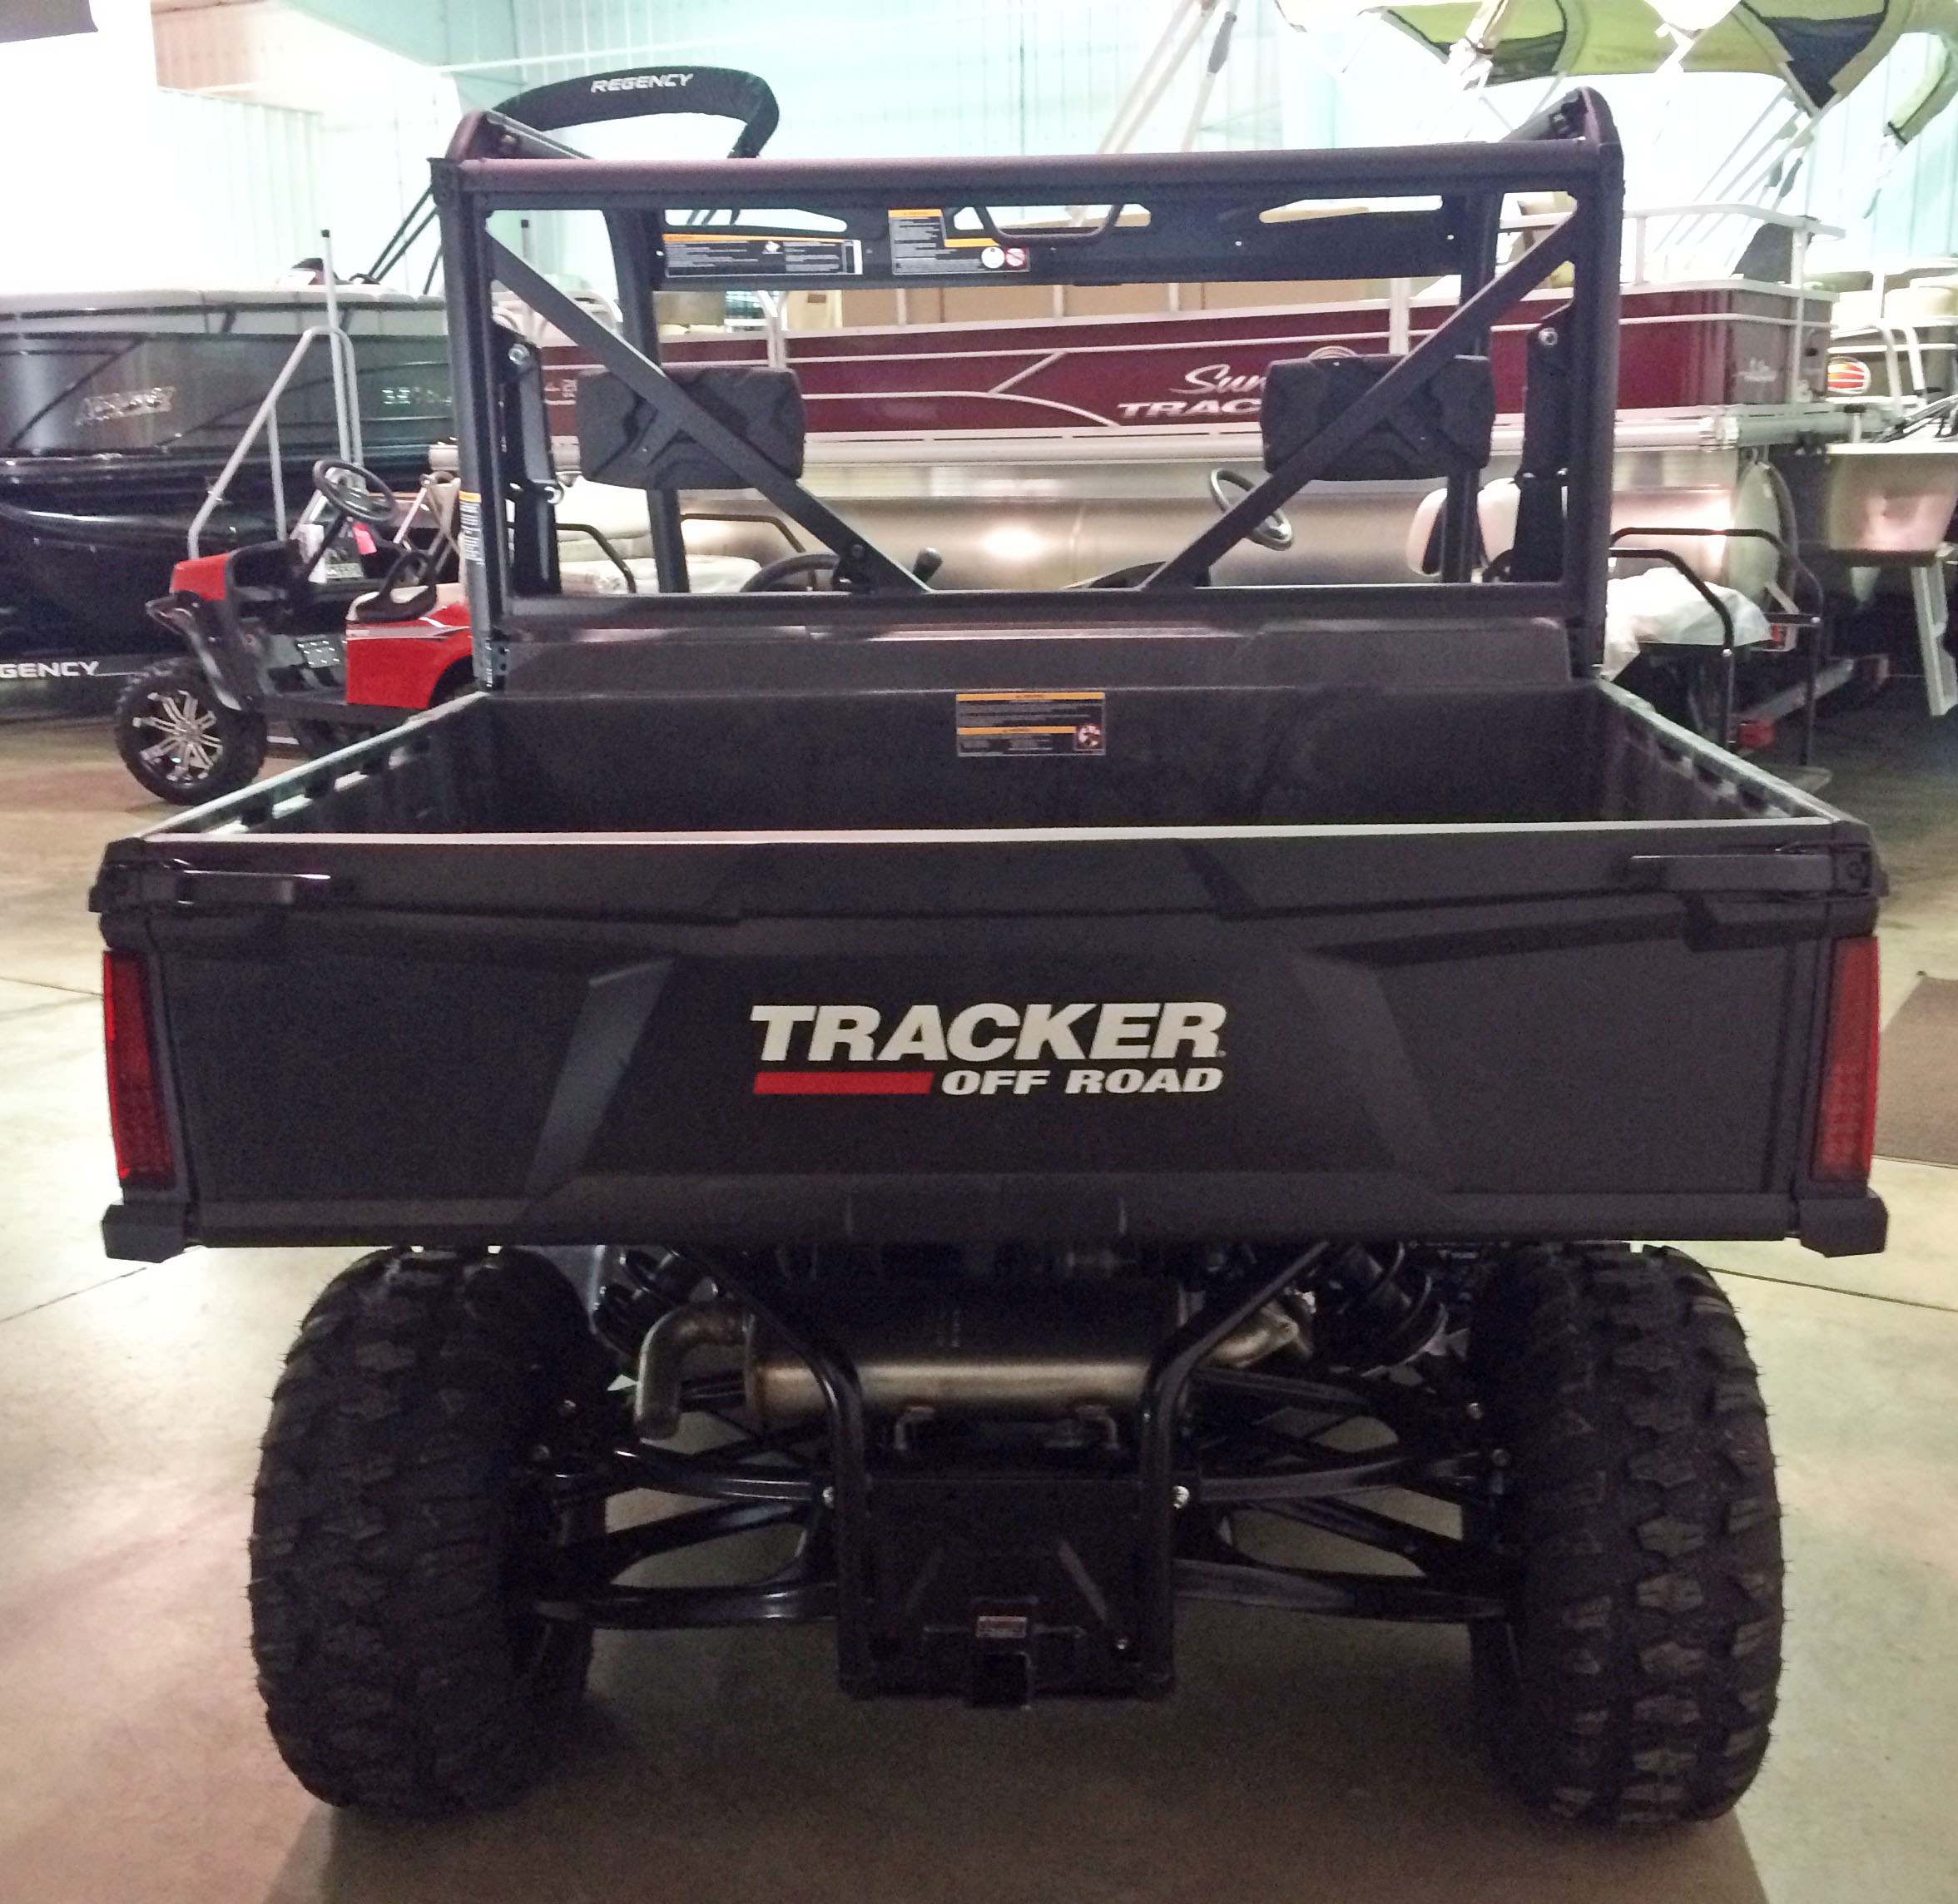 20ss428 2020 Tracker Off Road 800sx Price 11 499 Minot